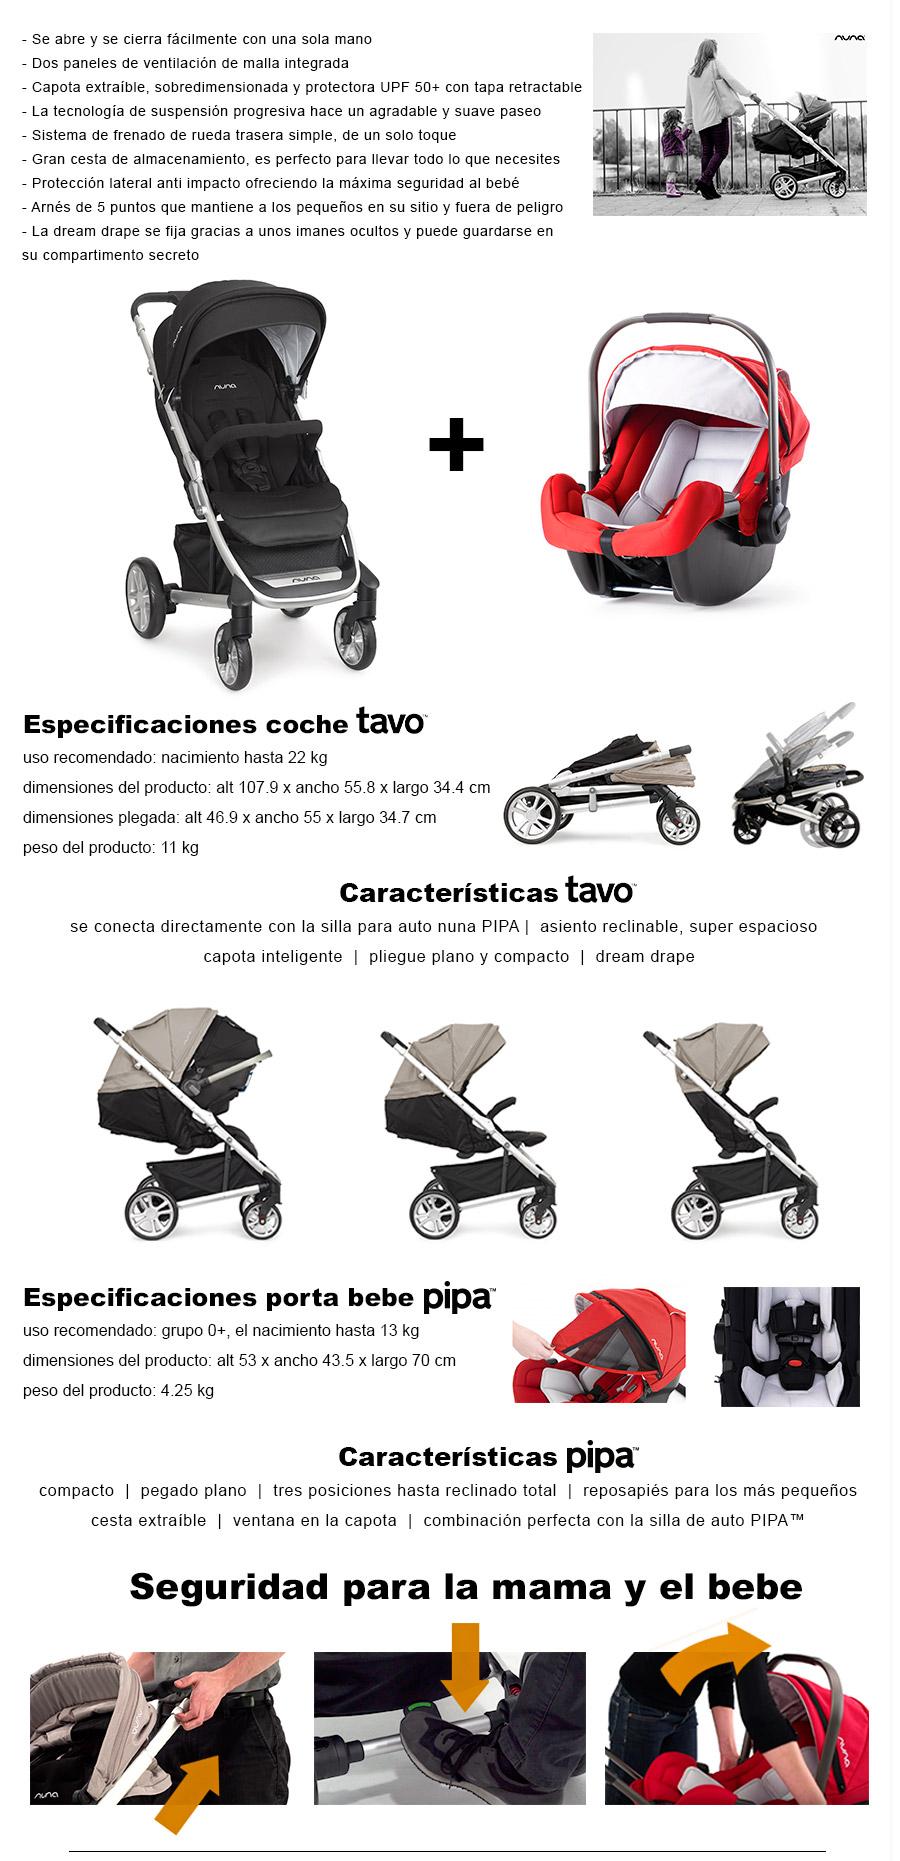 Cochecito Travel System Nuna Tavo Caviar + Huevito Pipa | Tinoky ...